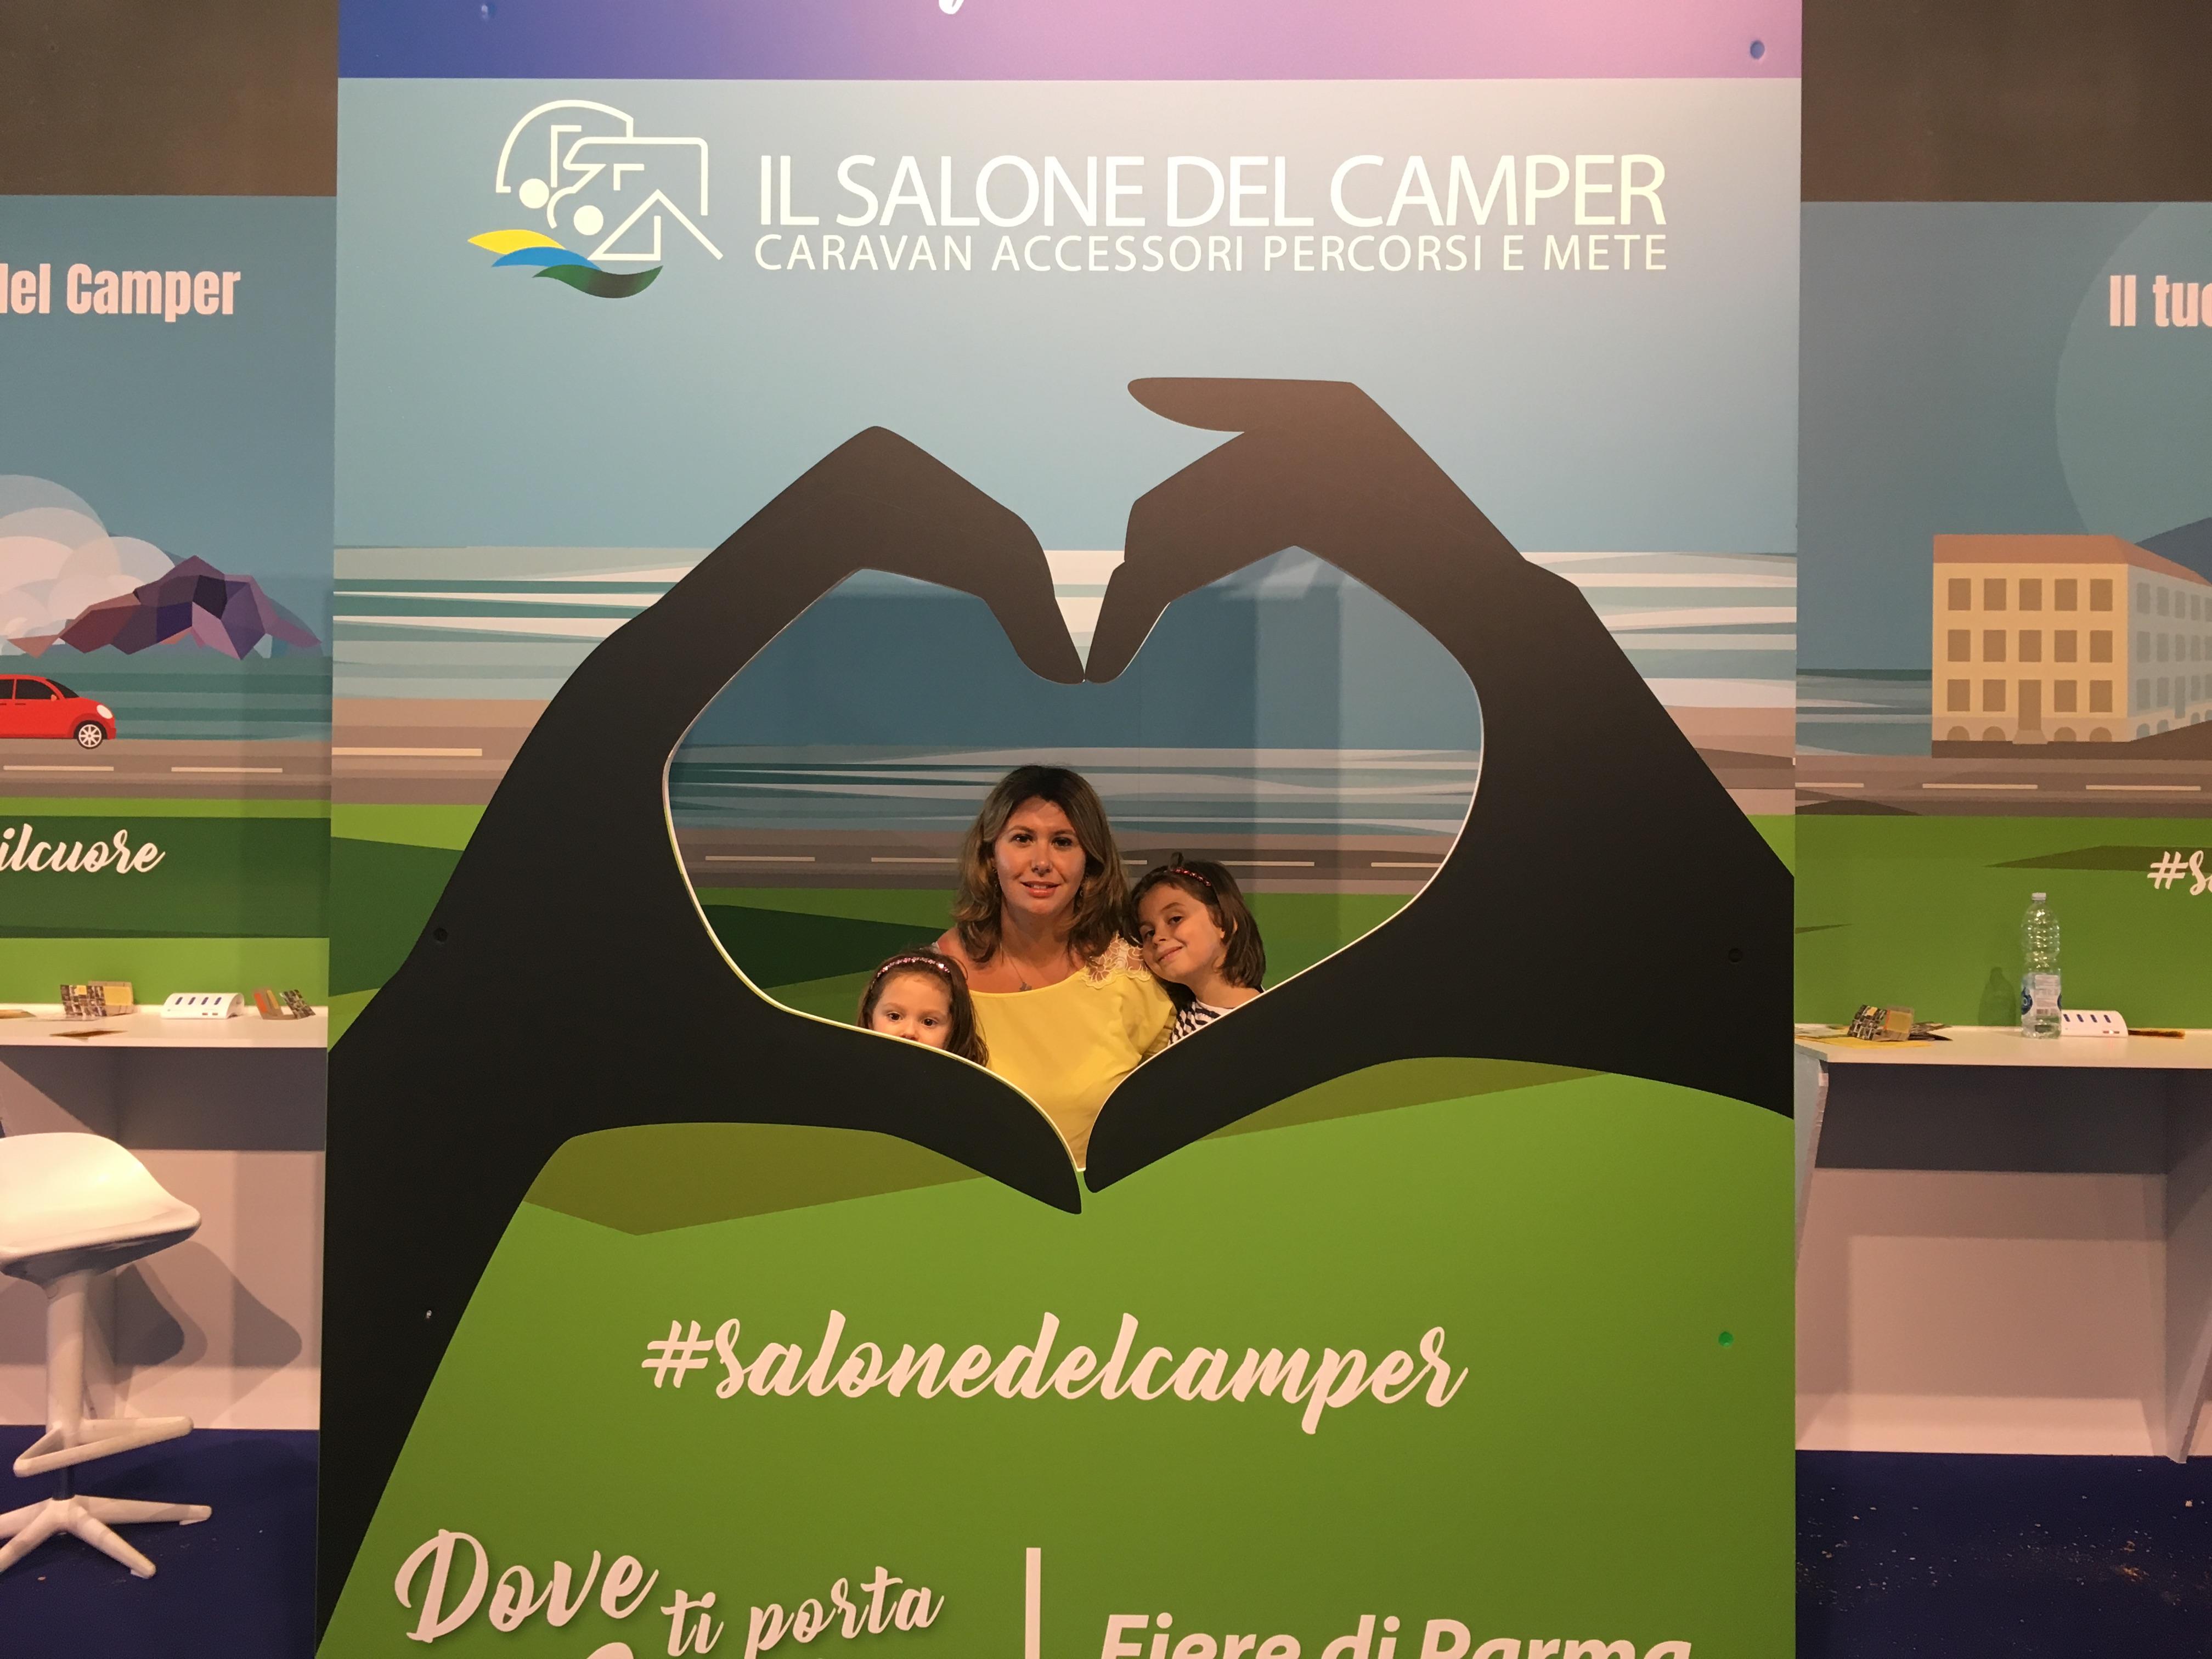 Fiera del Camper Parma MammaInViaggio